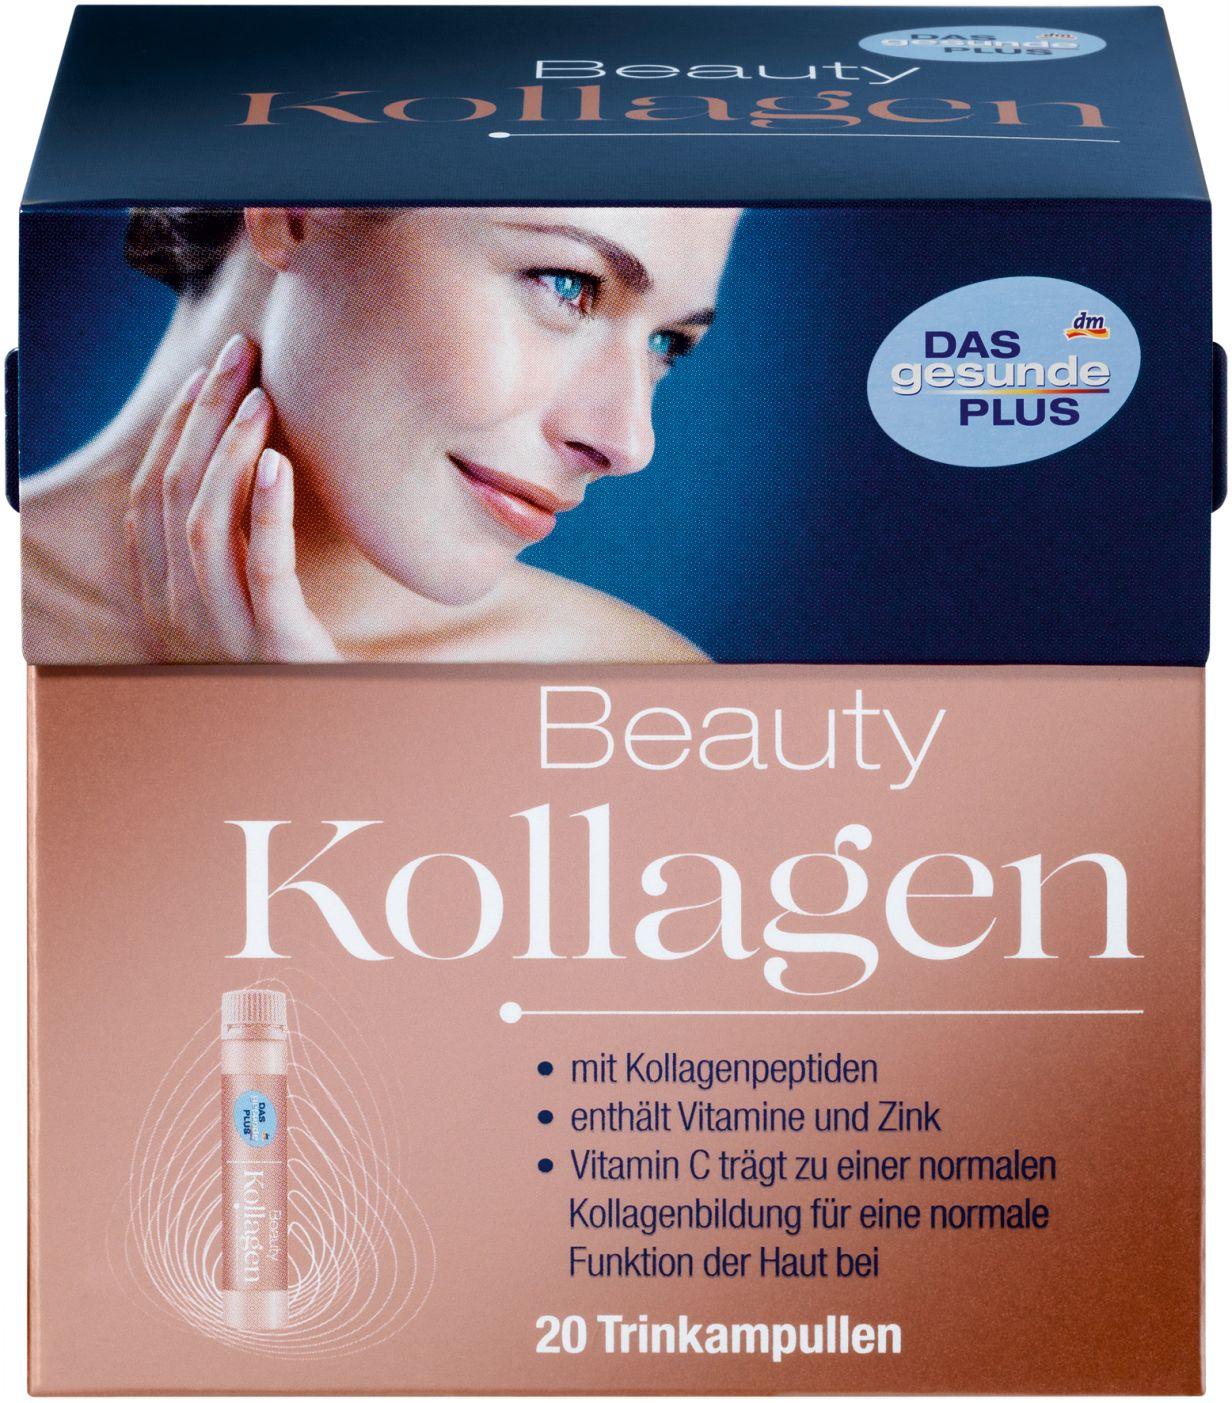 Verbraucherwarnung Das Gesunde Plus Beauty Kollagen